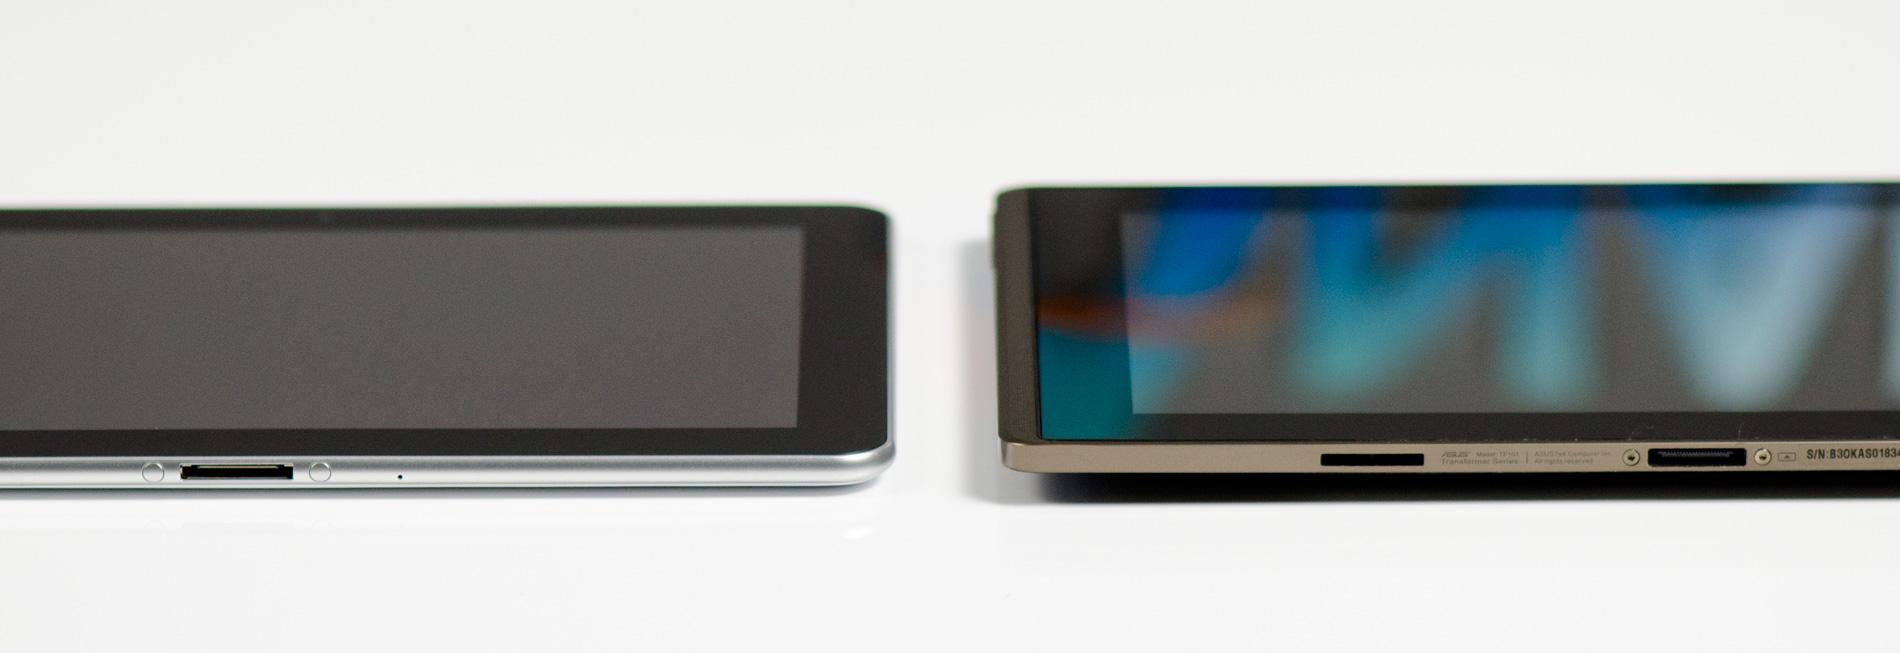 Samsung Galaxy Tab 10.1 Review: The Sleekest Honeycomb Tablet